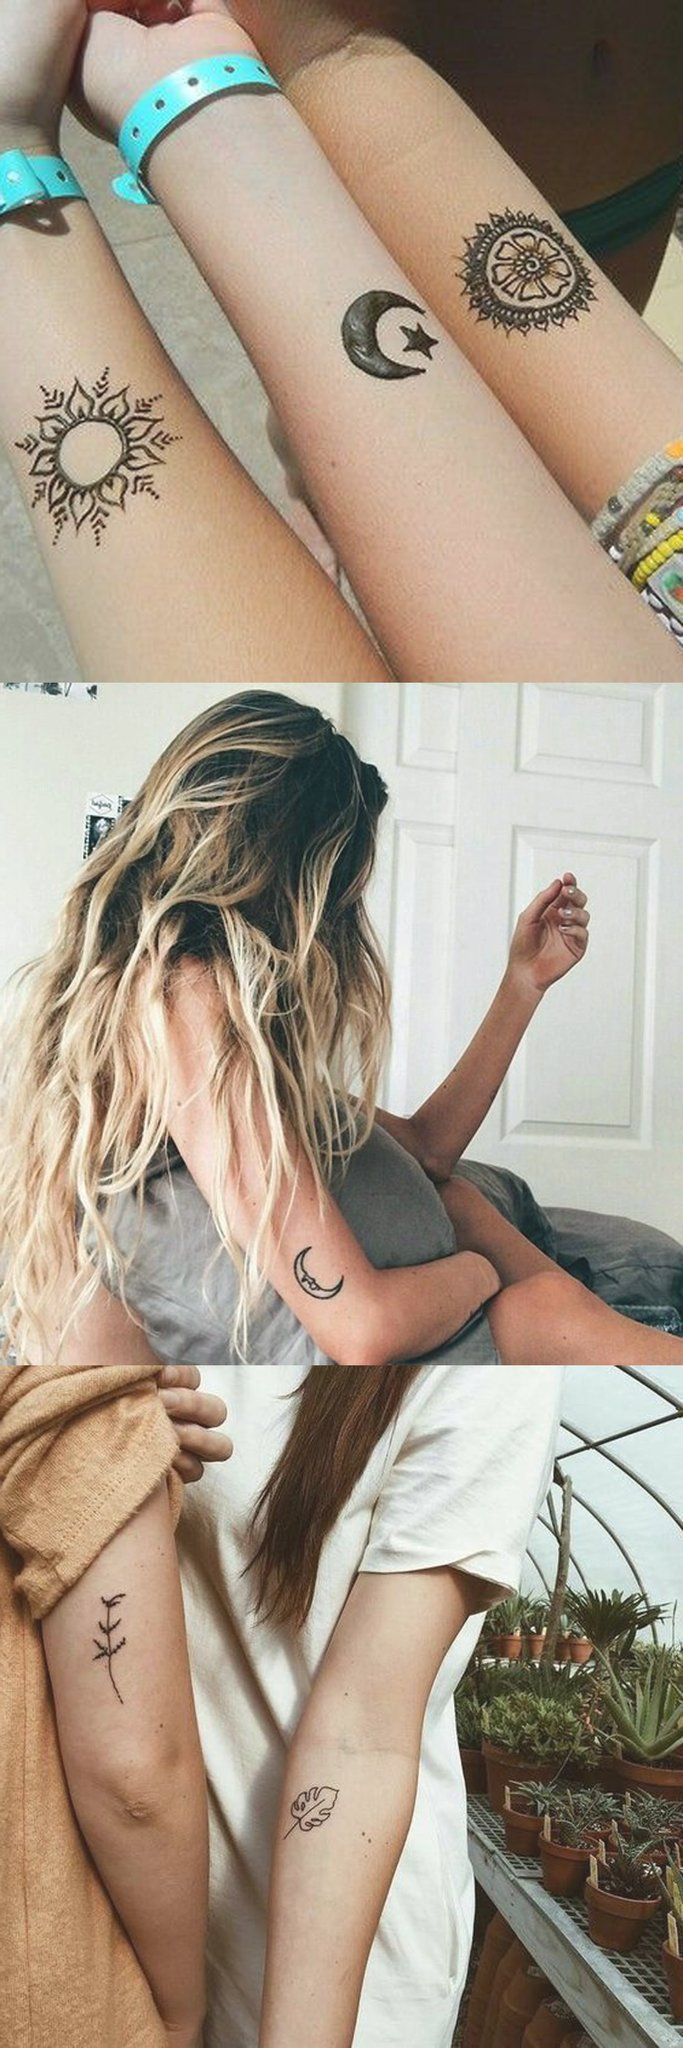 Triba Bohol Tattoo Ideas for Women – Small Mandala Sun and Moon Wrist Tatt – Lea…